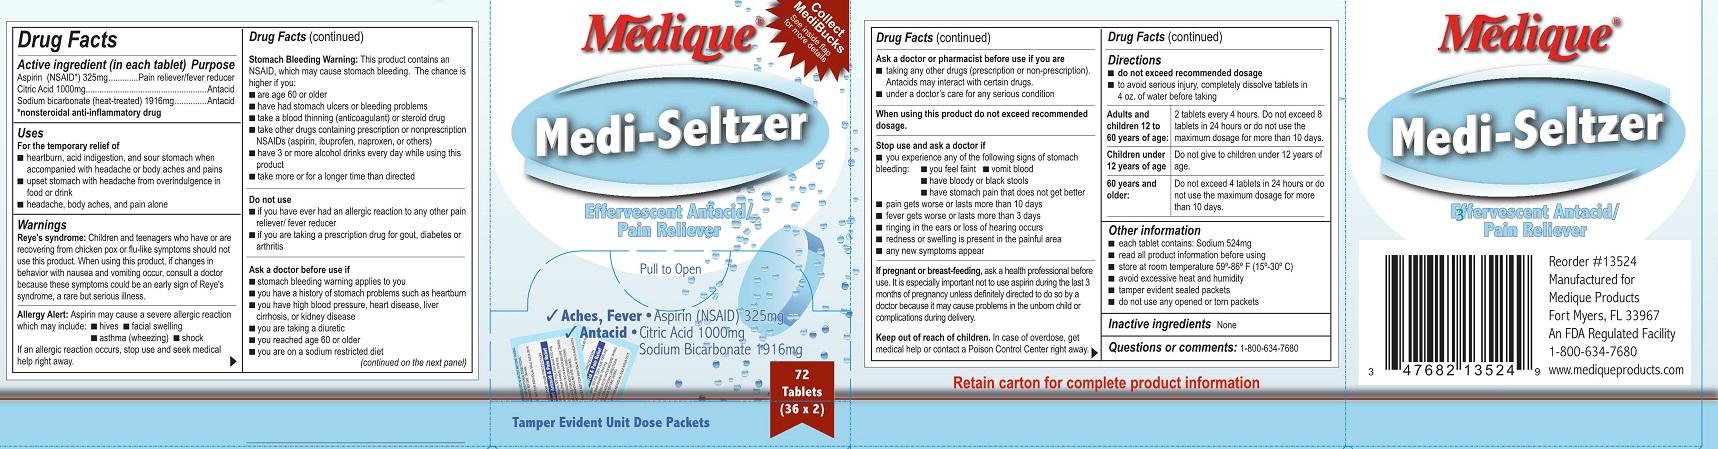 Medique Mediseltzer